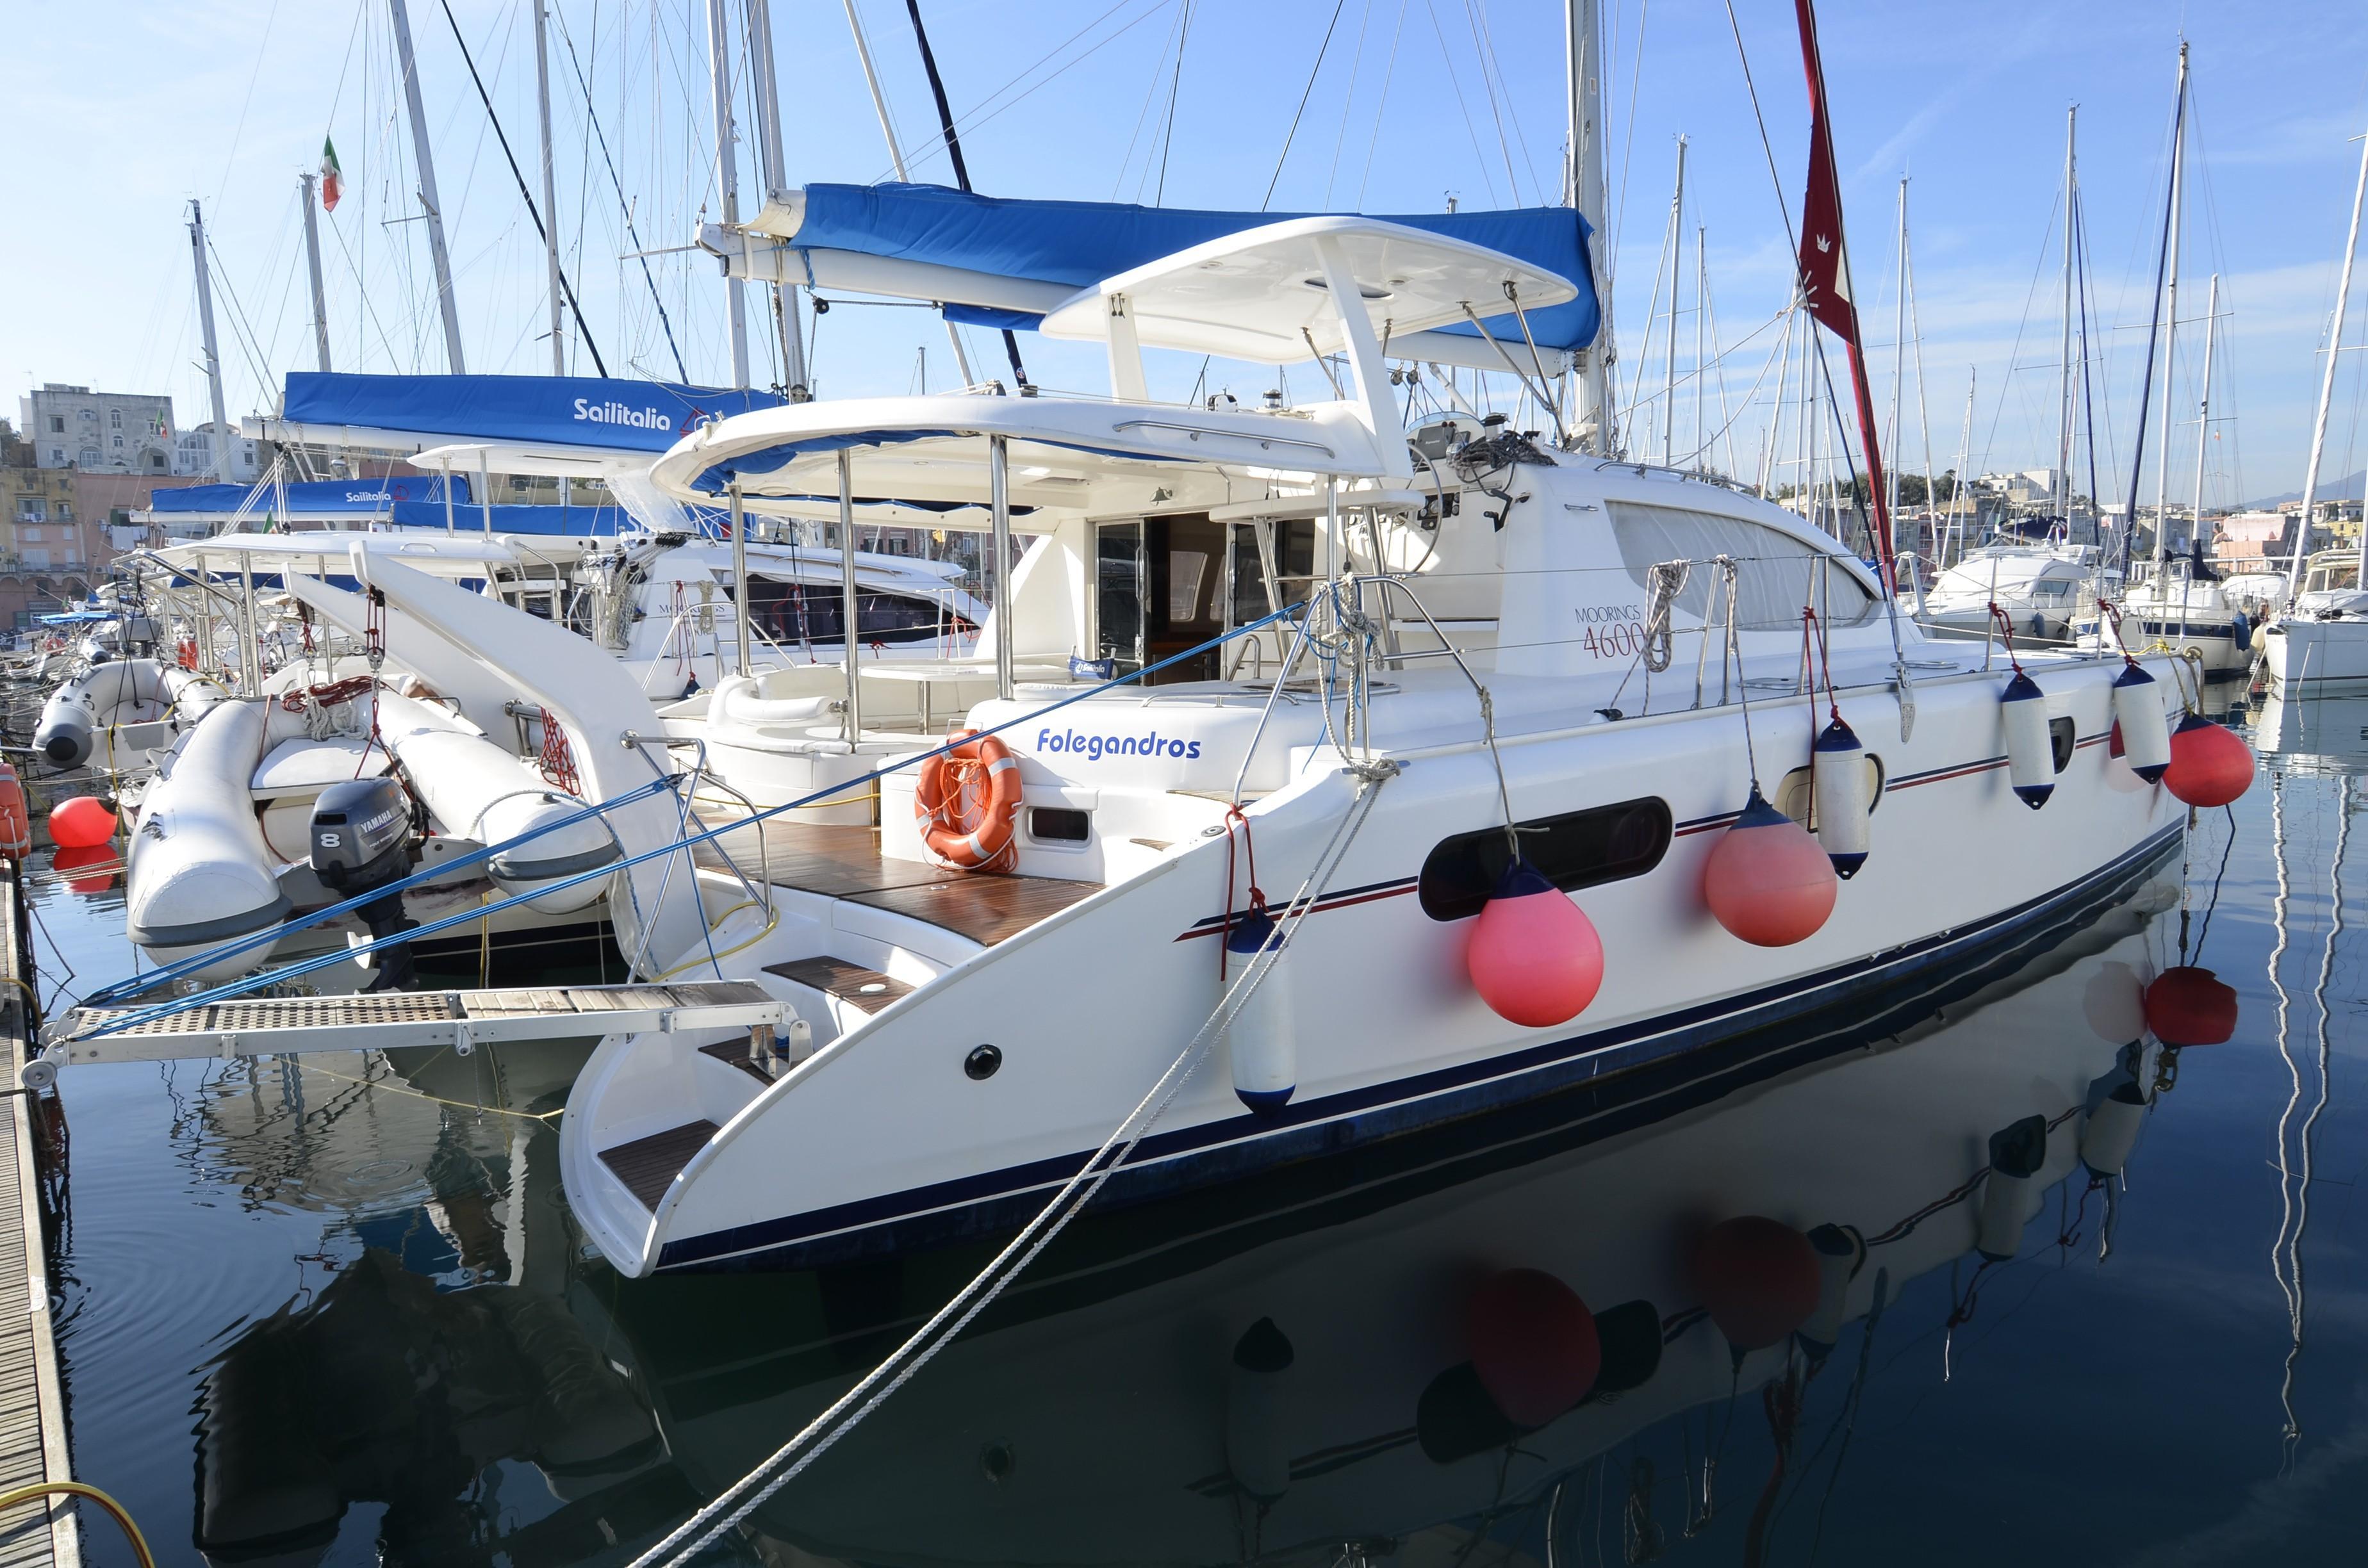 Leopard 46 Sailing Catamaran for sale | The Moorings Yacht ...